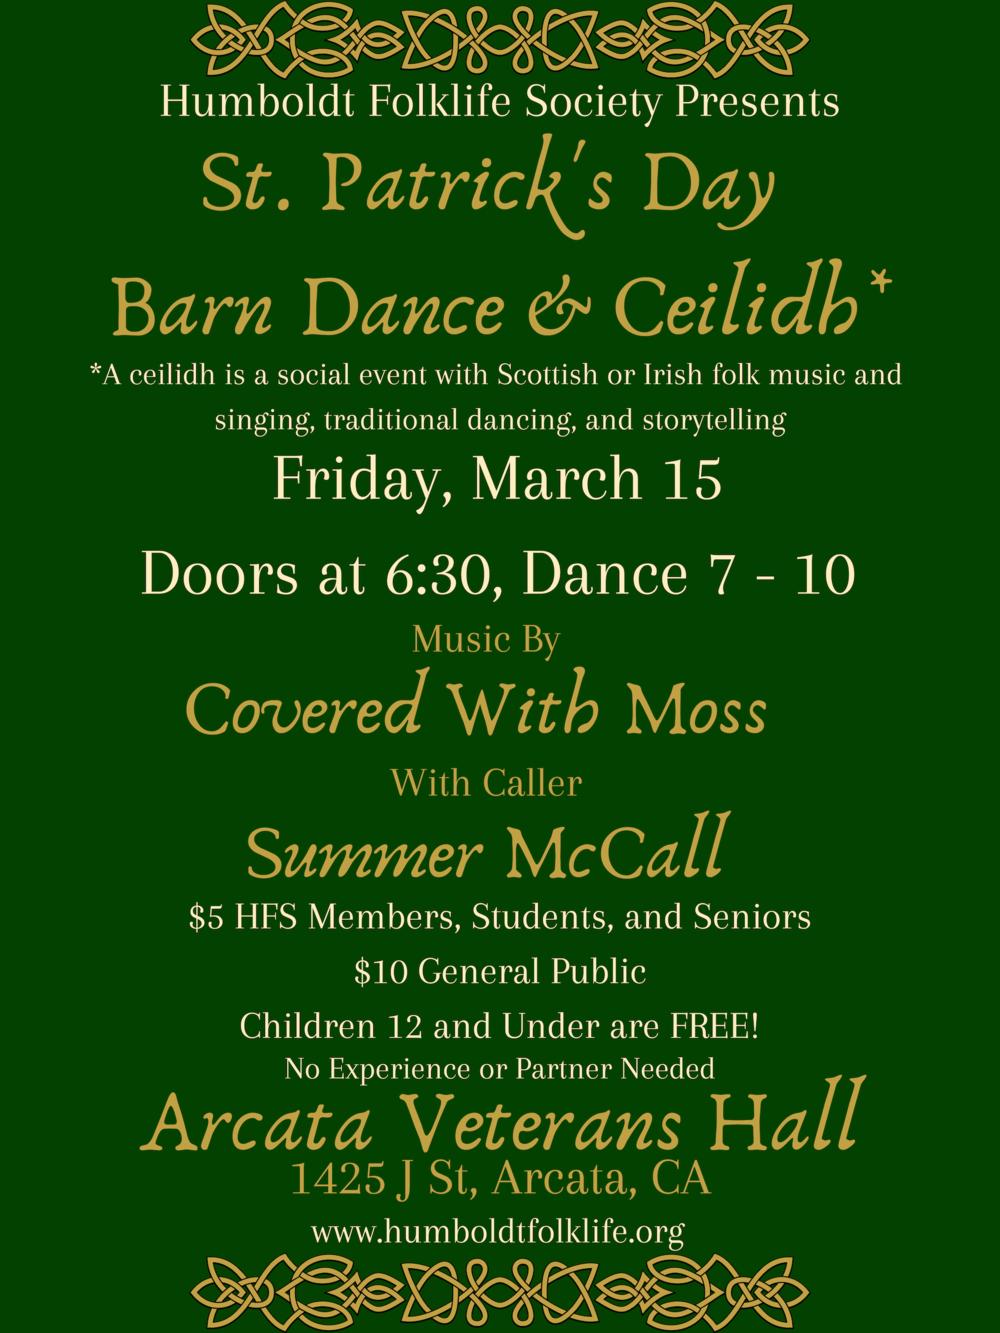 St. Patrick's HFS Flyer.png